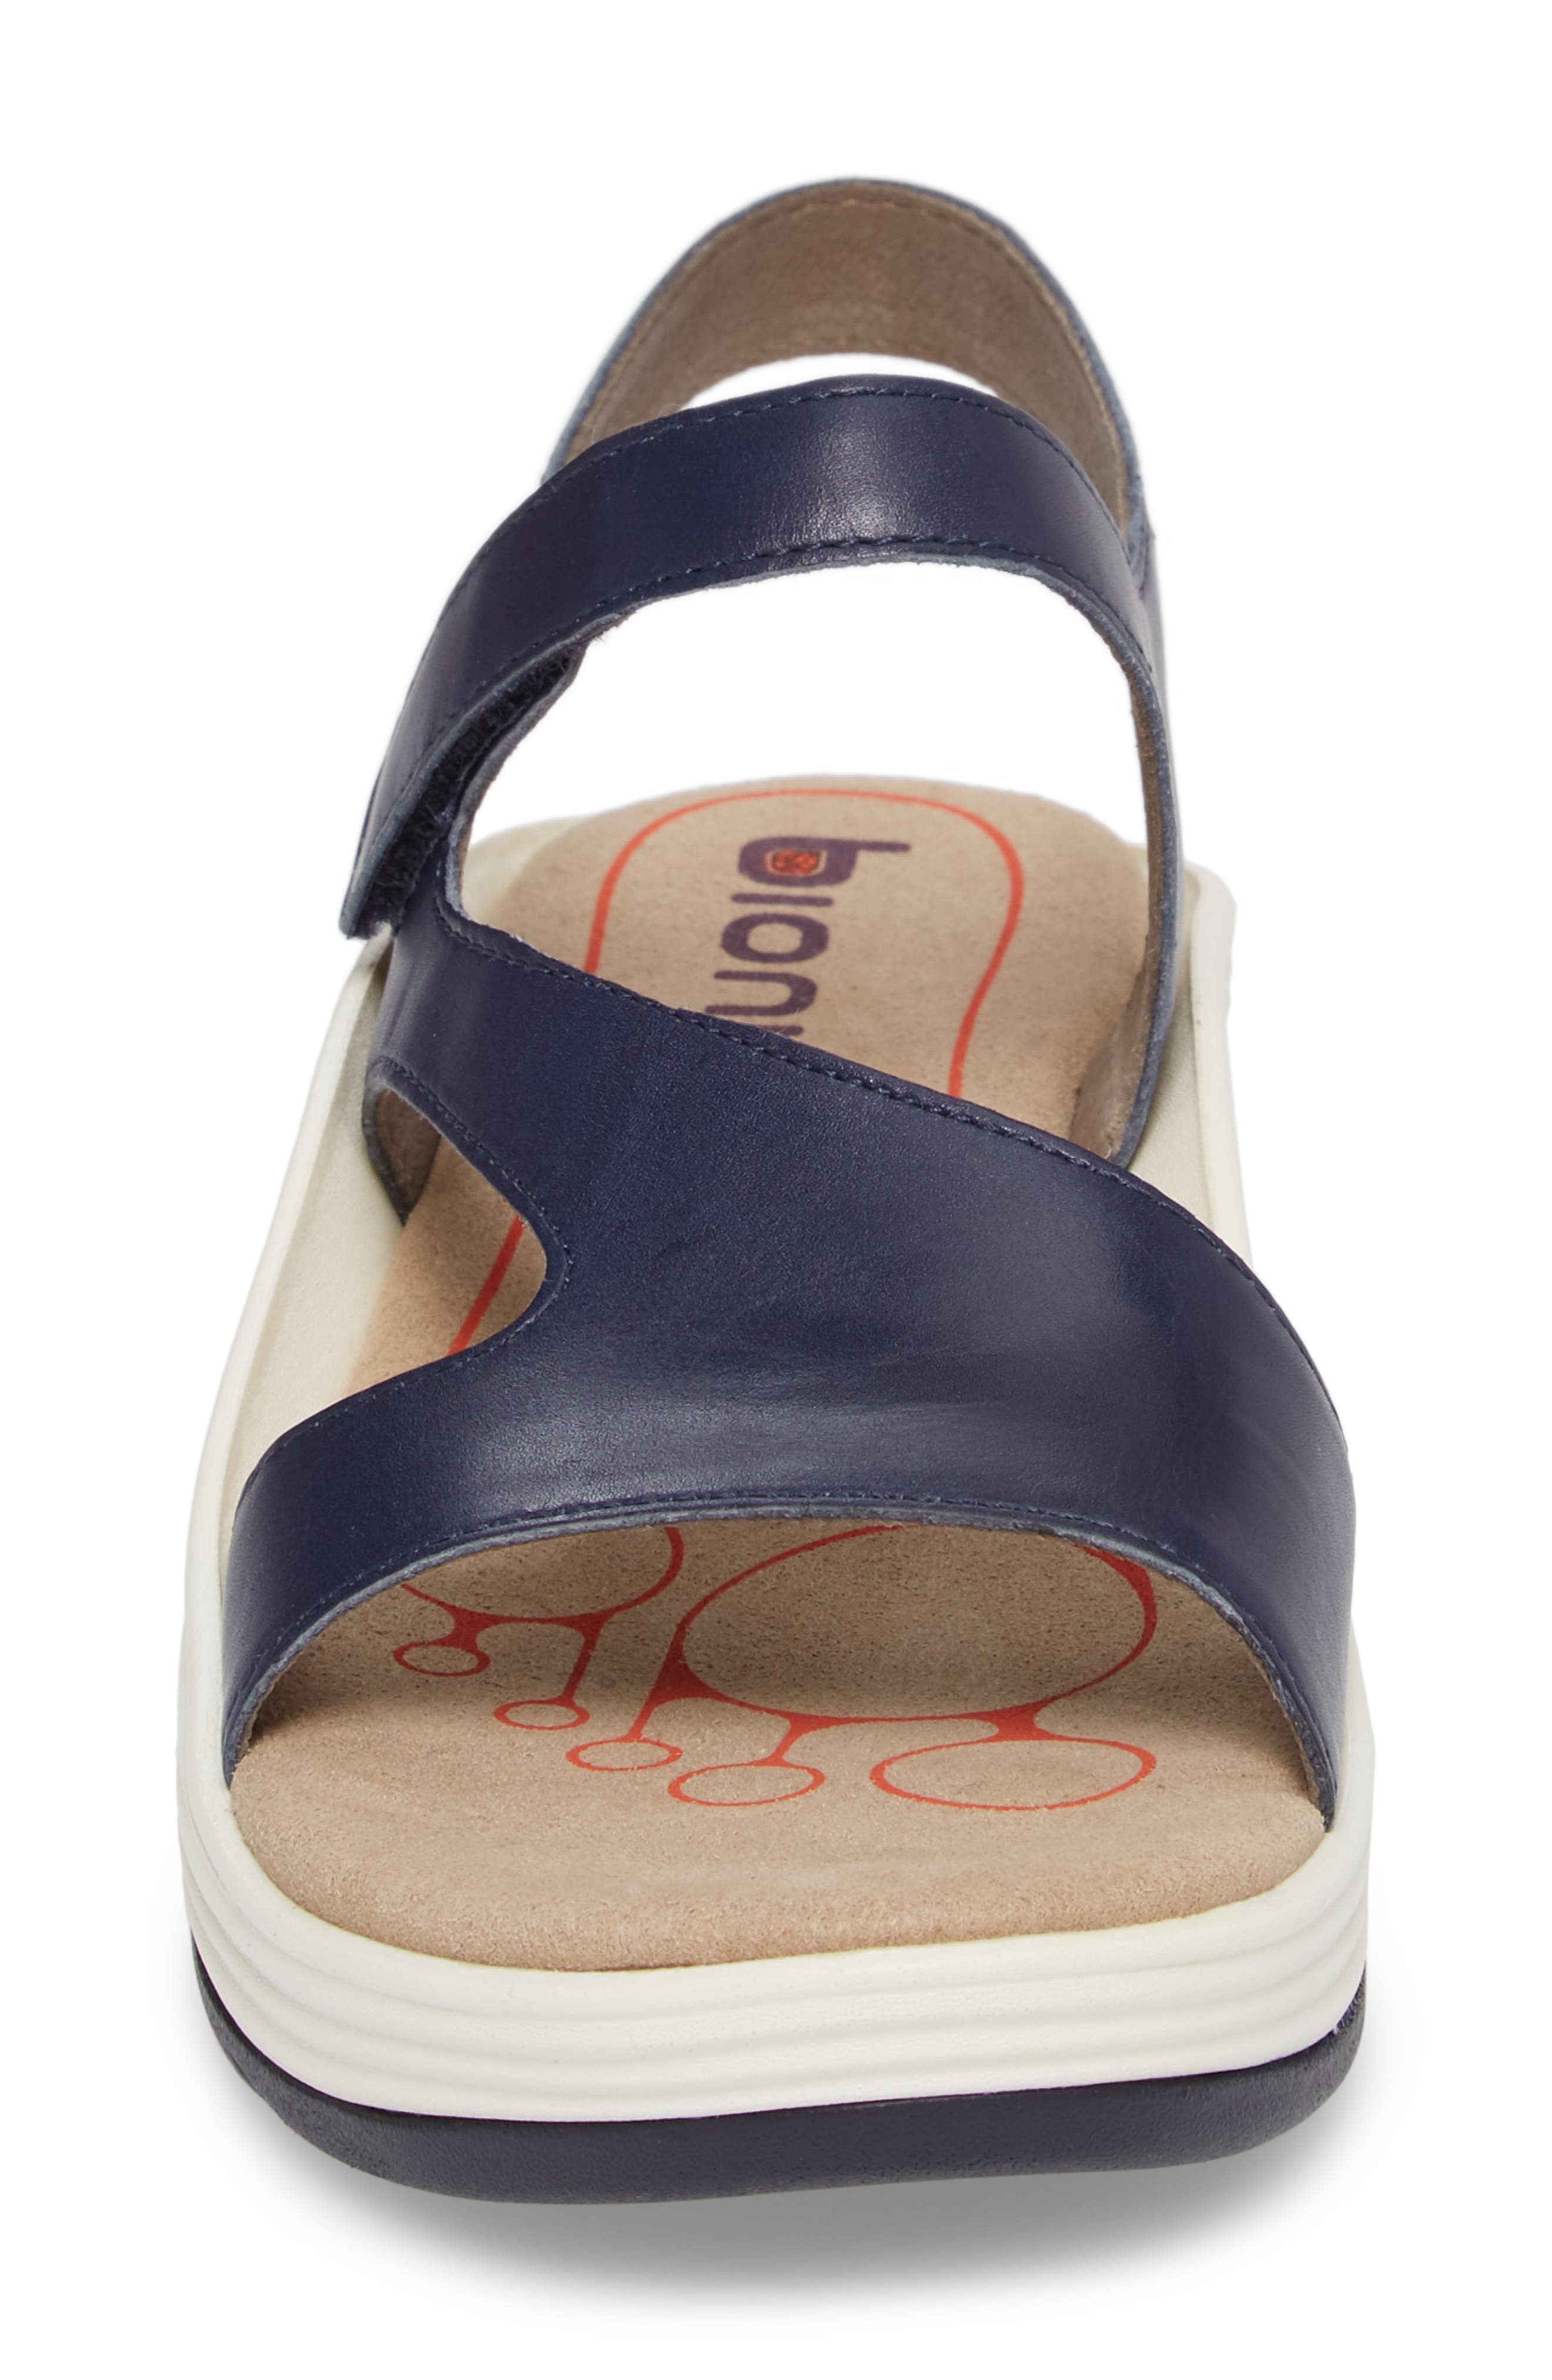 Cybele Platform Sandal,                             Alternate thumbnail 4, color,                             PEACOAT NAVY LEATHER